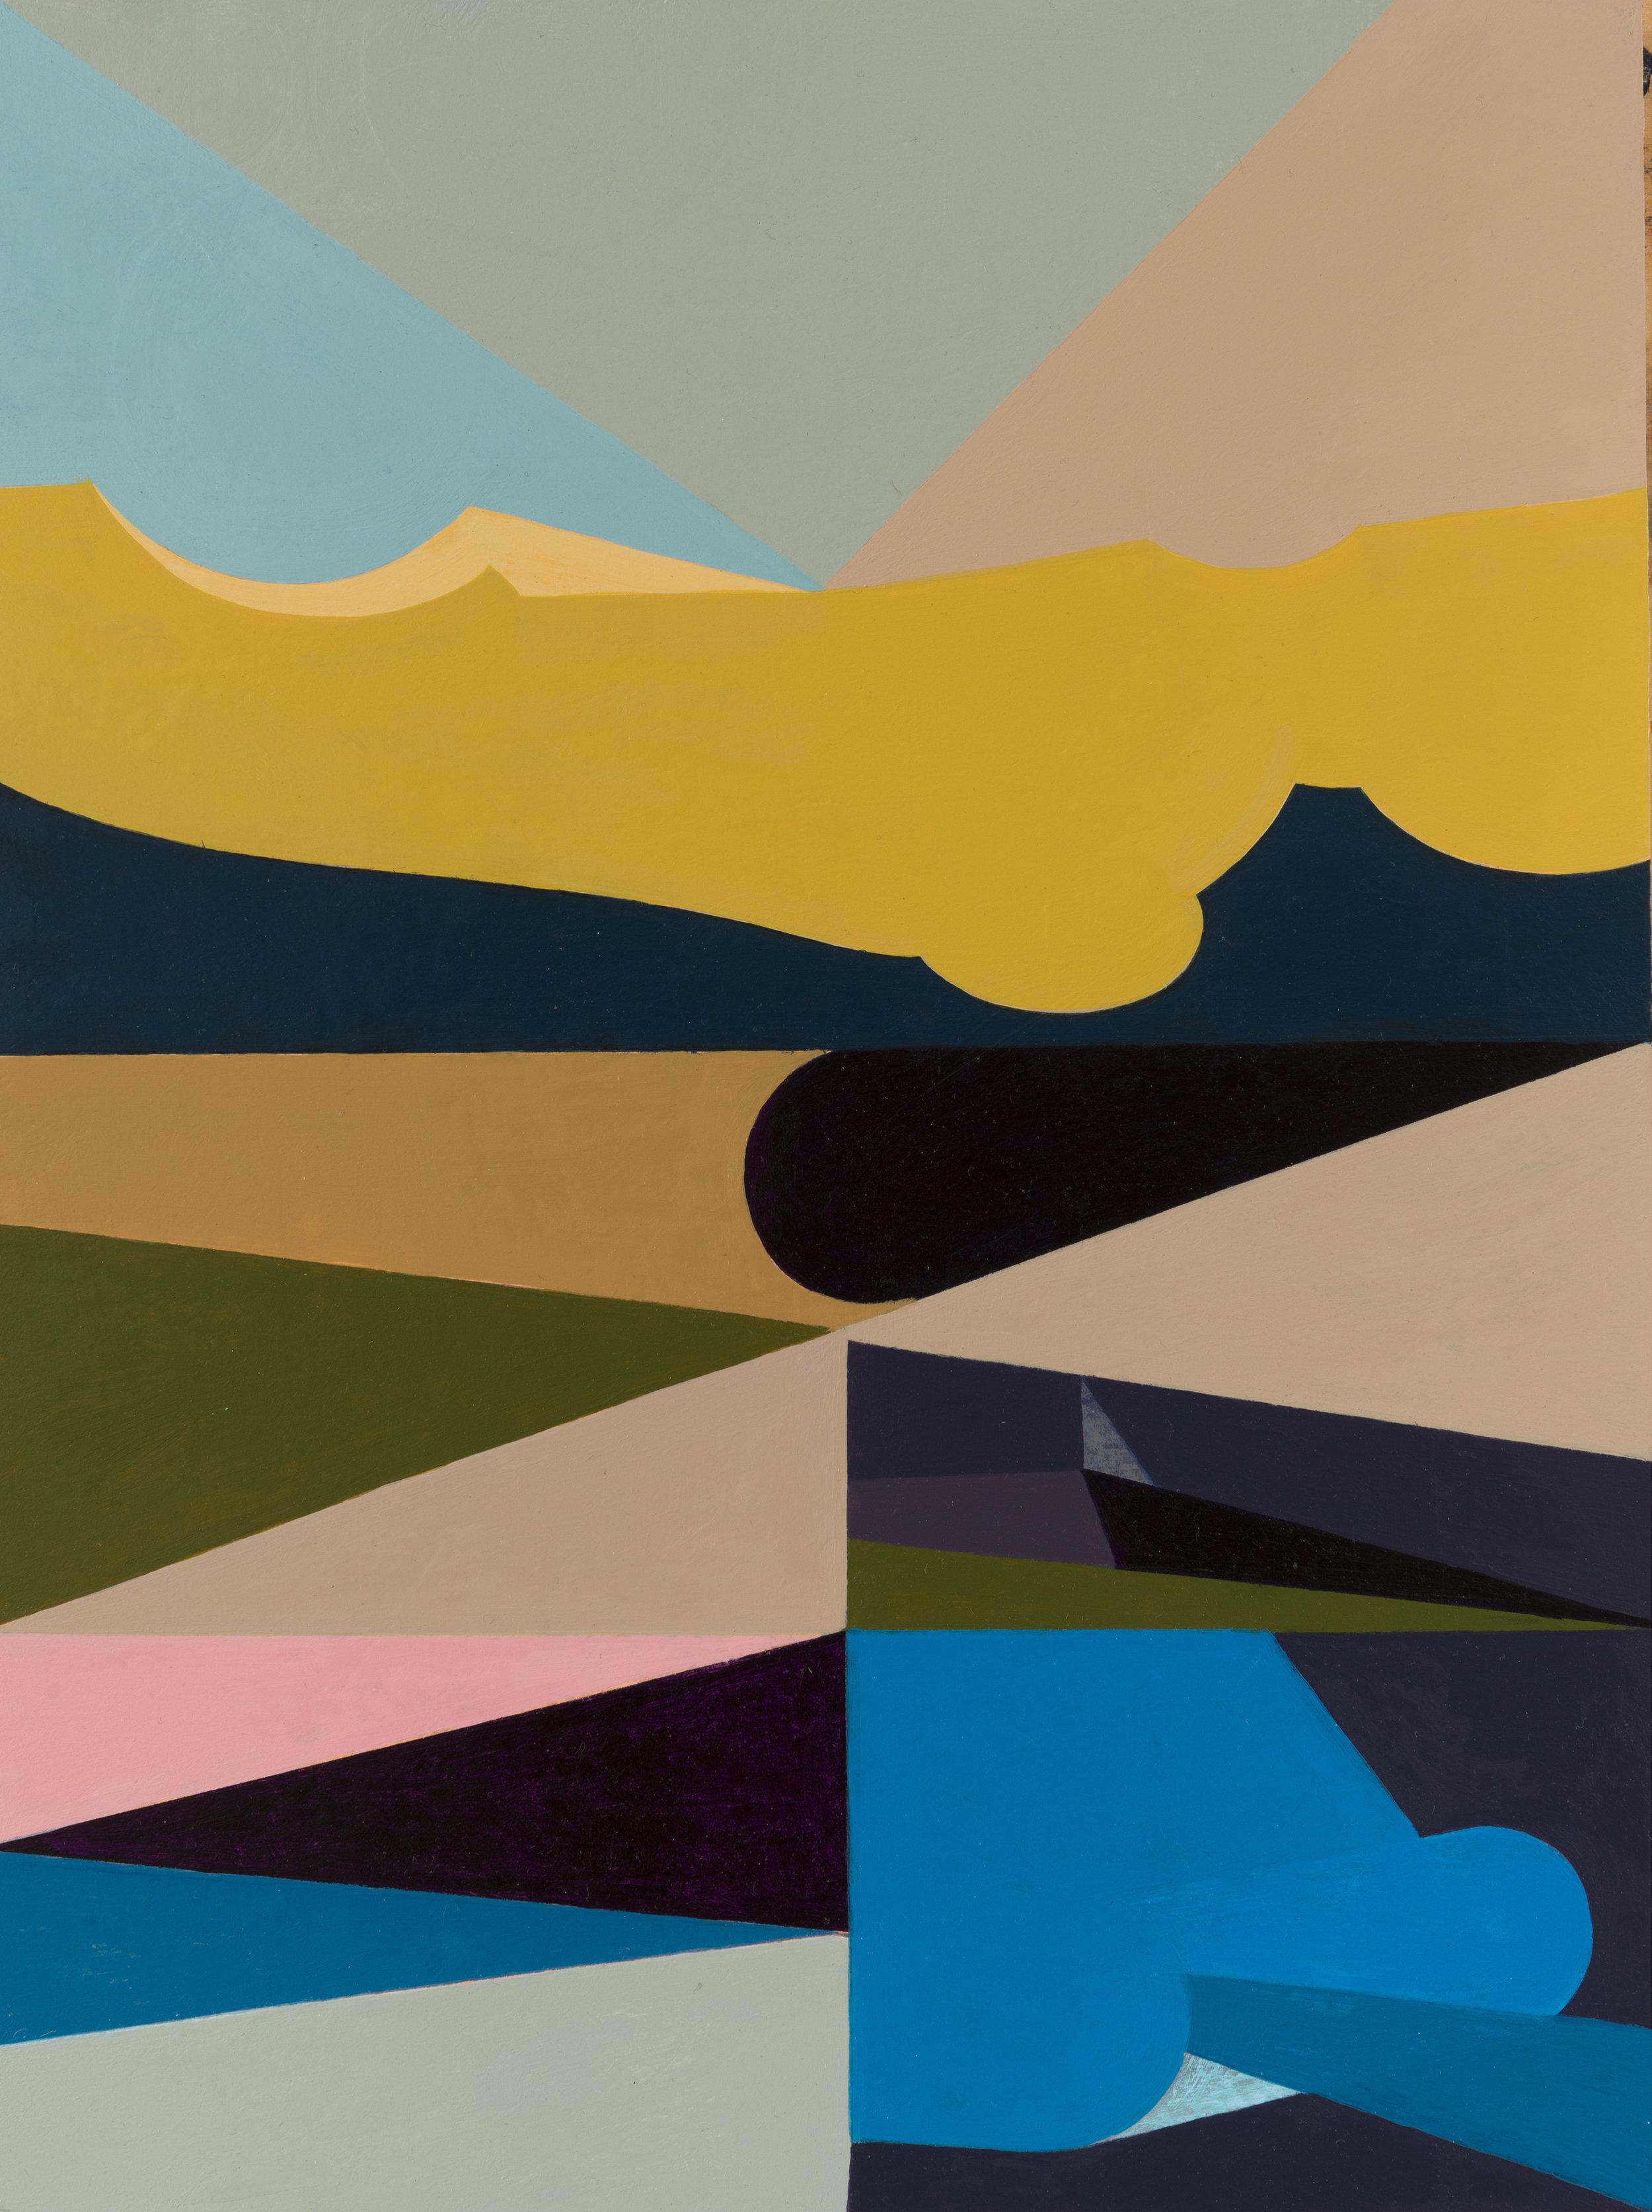 "Tavola, 2014-17 acrylic on panel 16 x 12"""